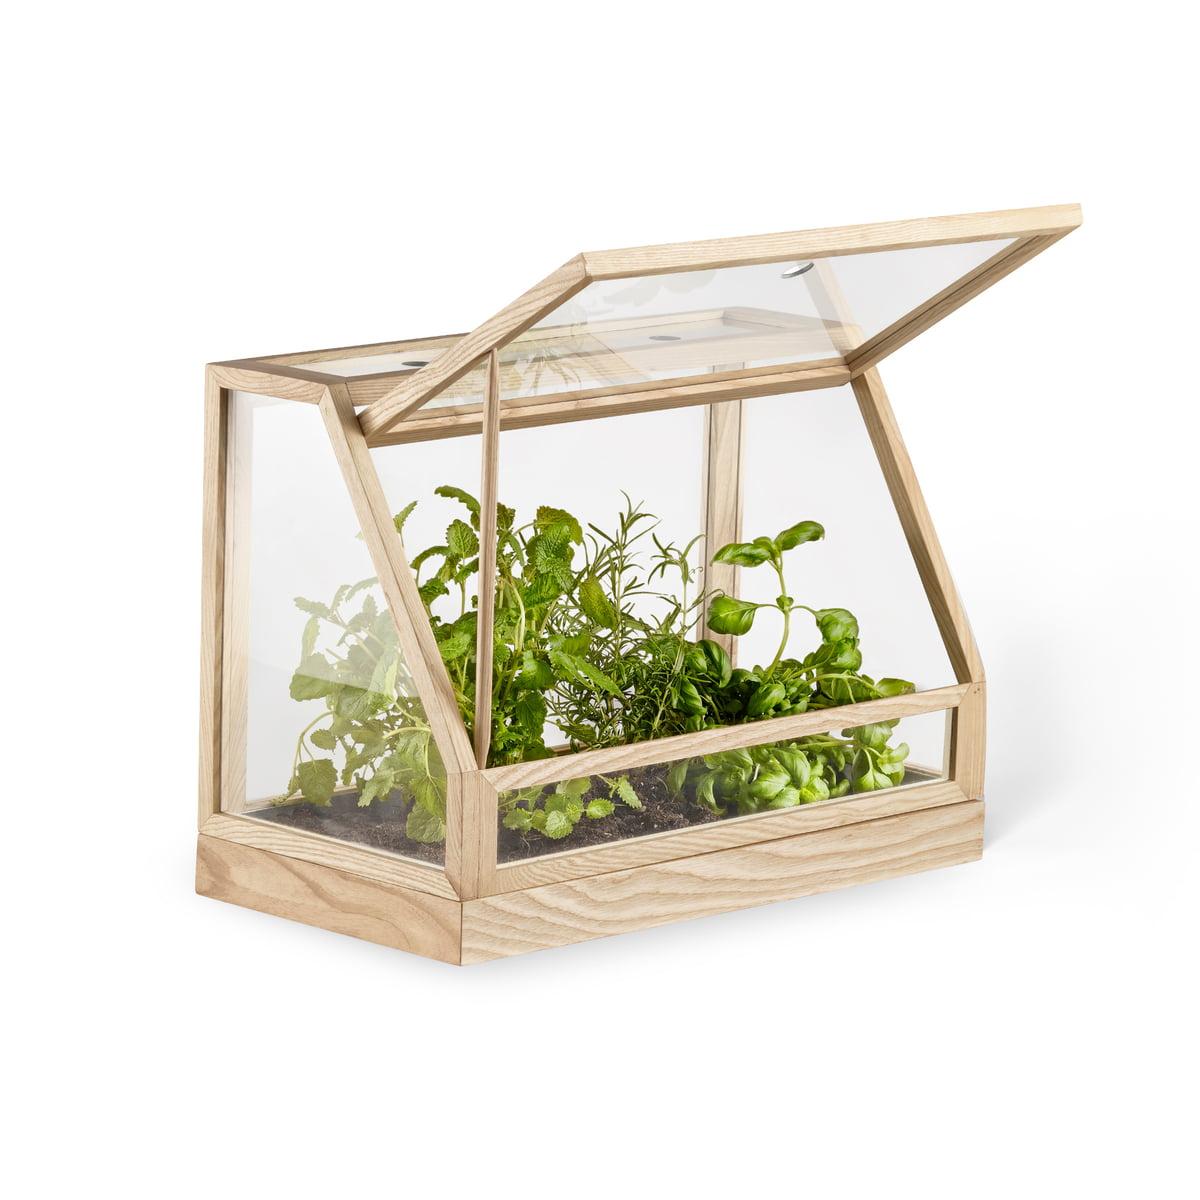 Greenhouse Mini von Design House Stockholm